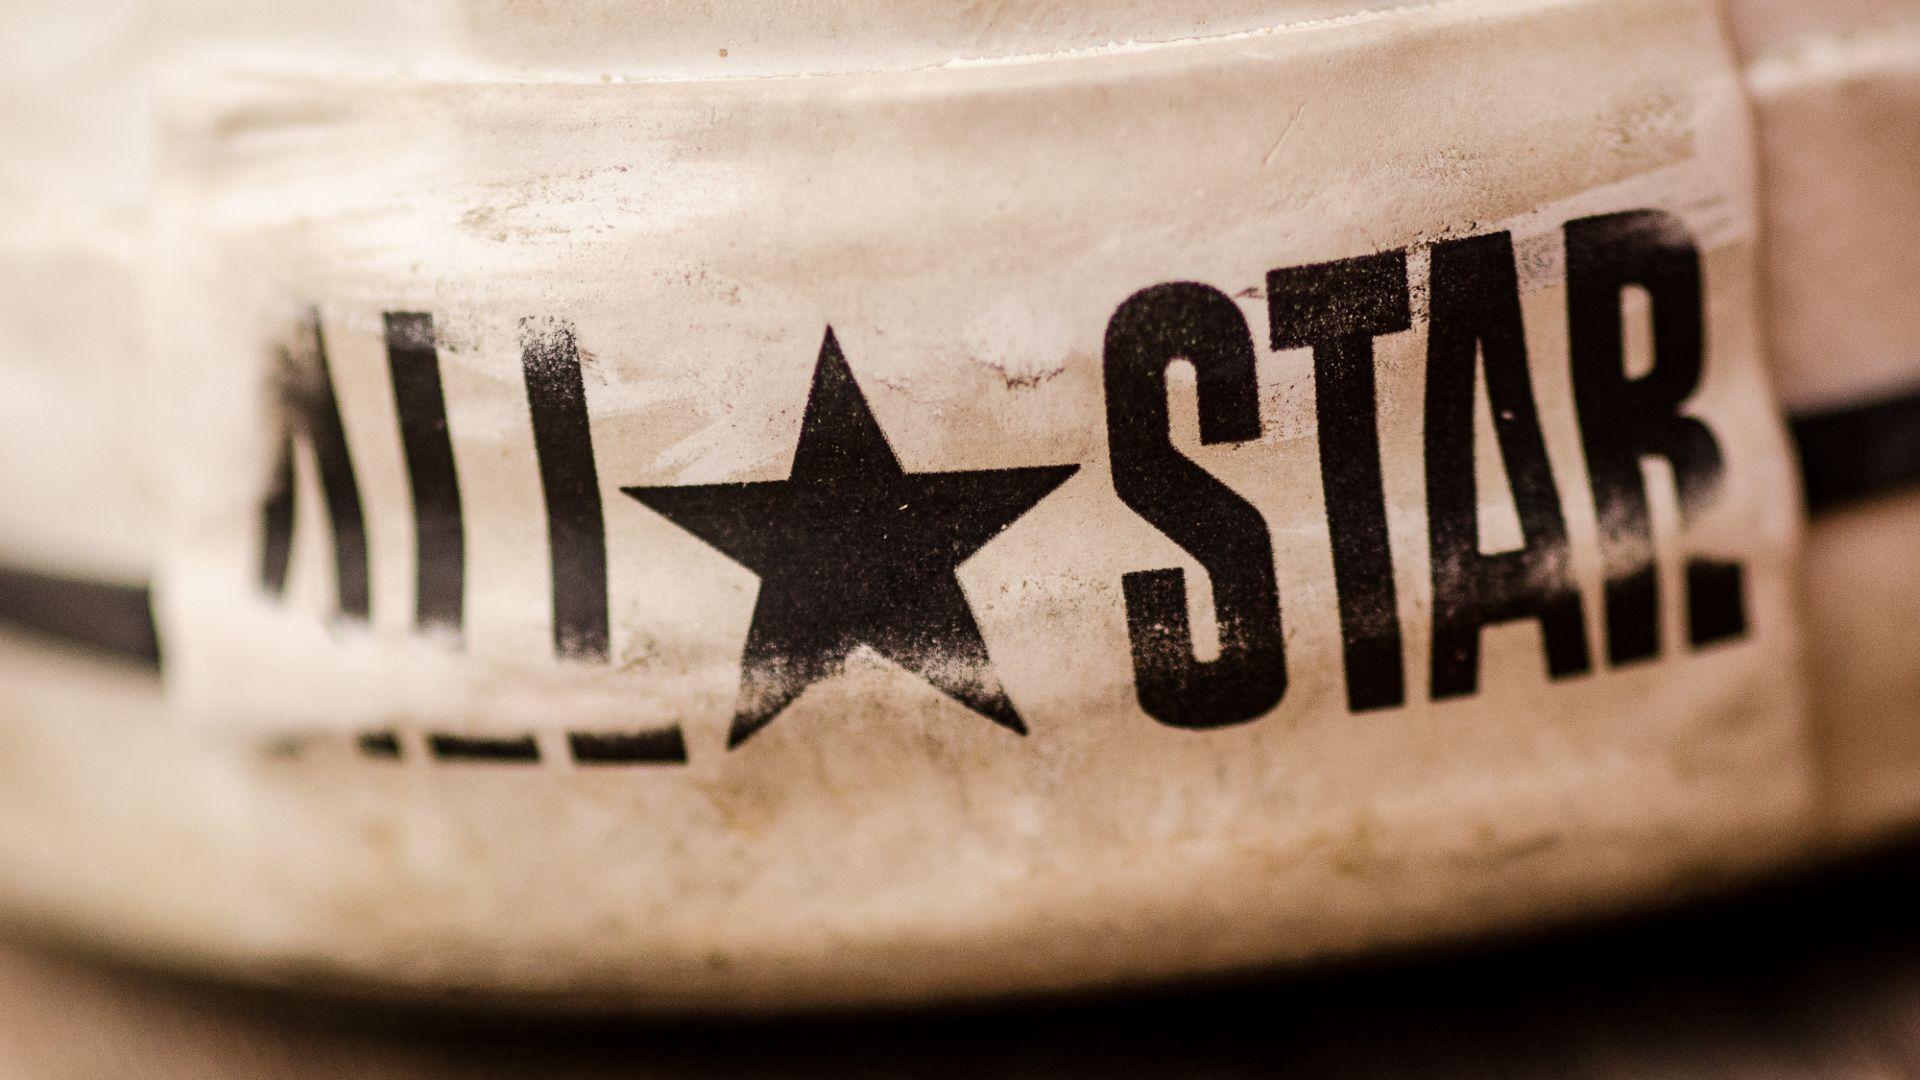 e8d0f3a16801 Converse All Star Logos Wallpaper Free HD